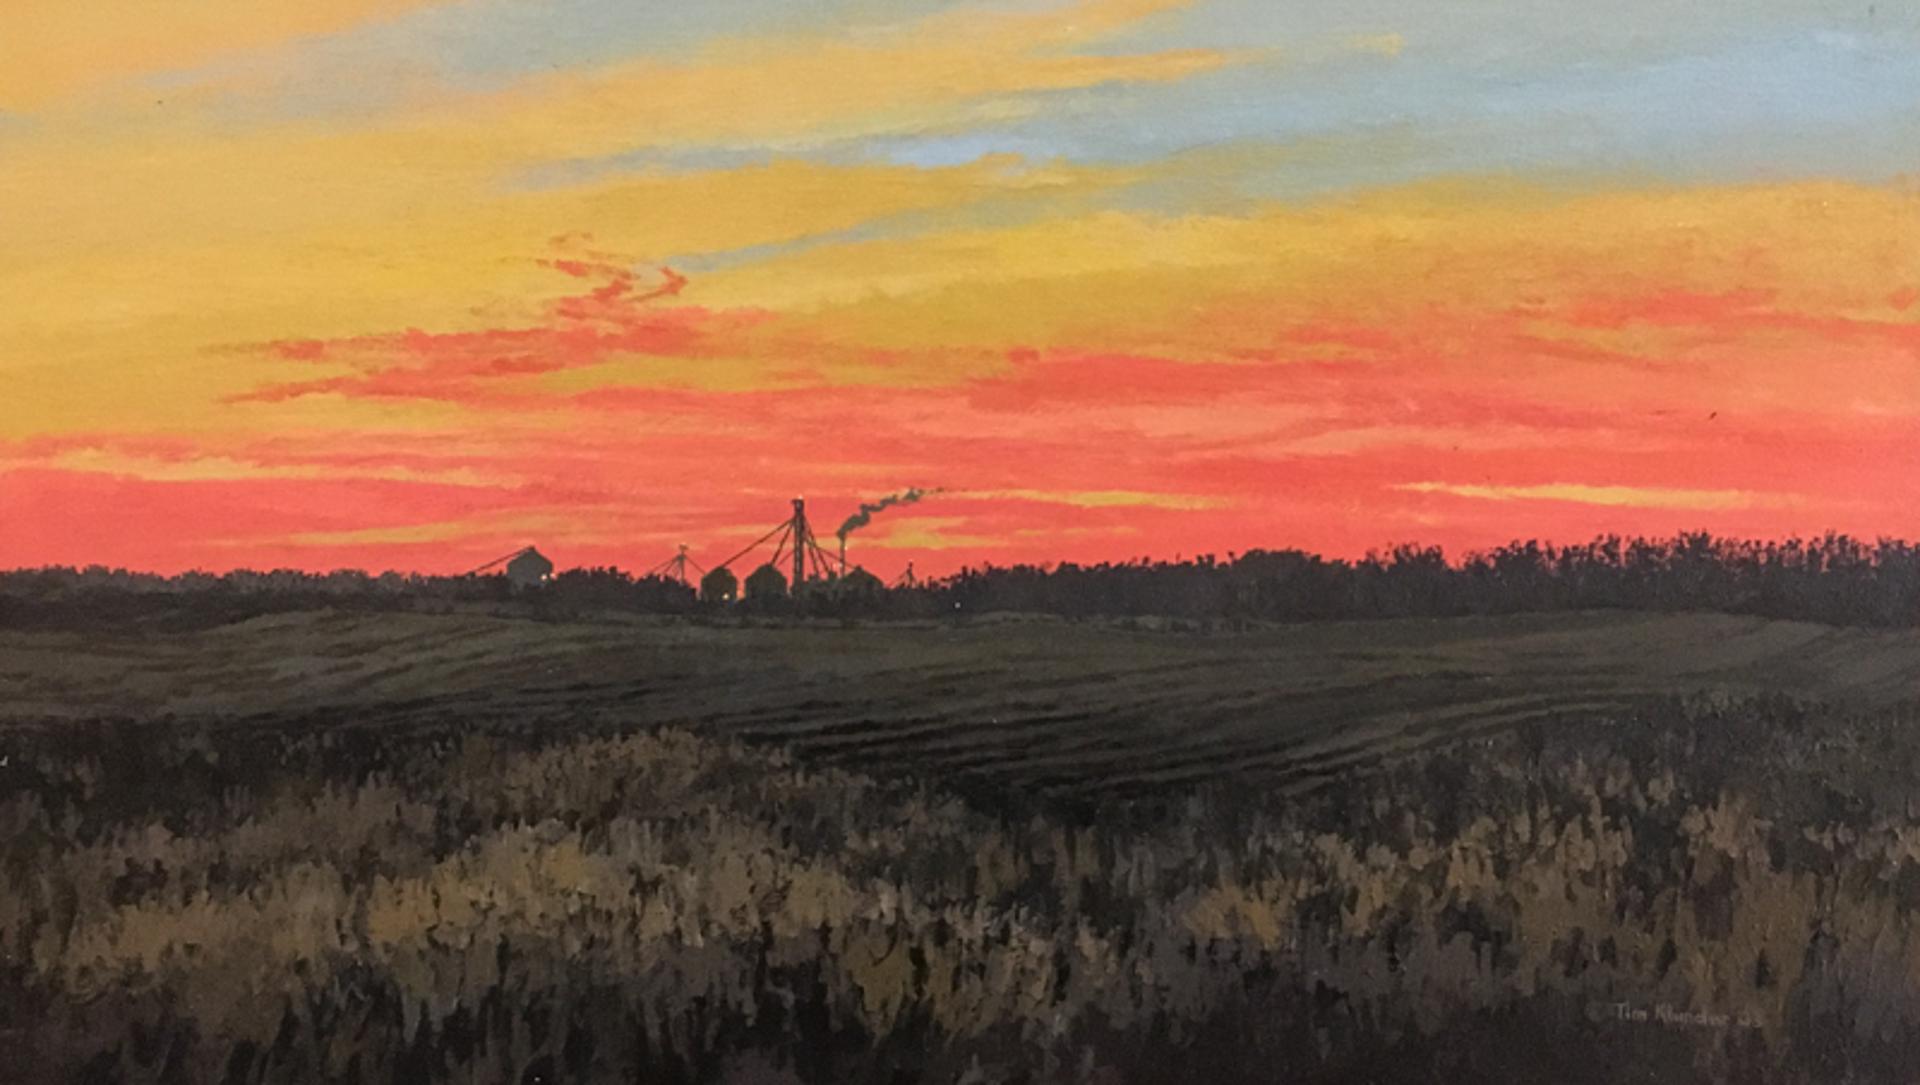 Red Sunset #1 by Tim Klunder